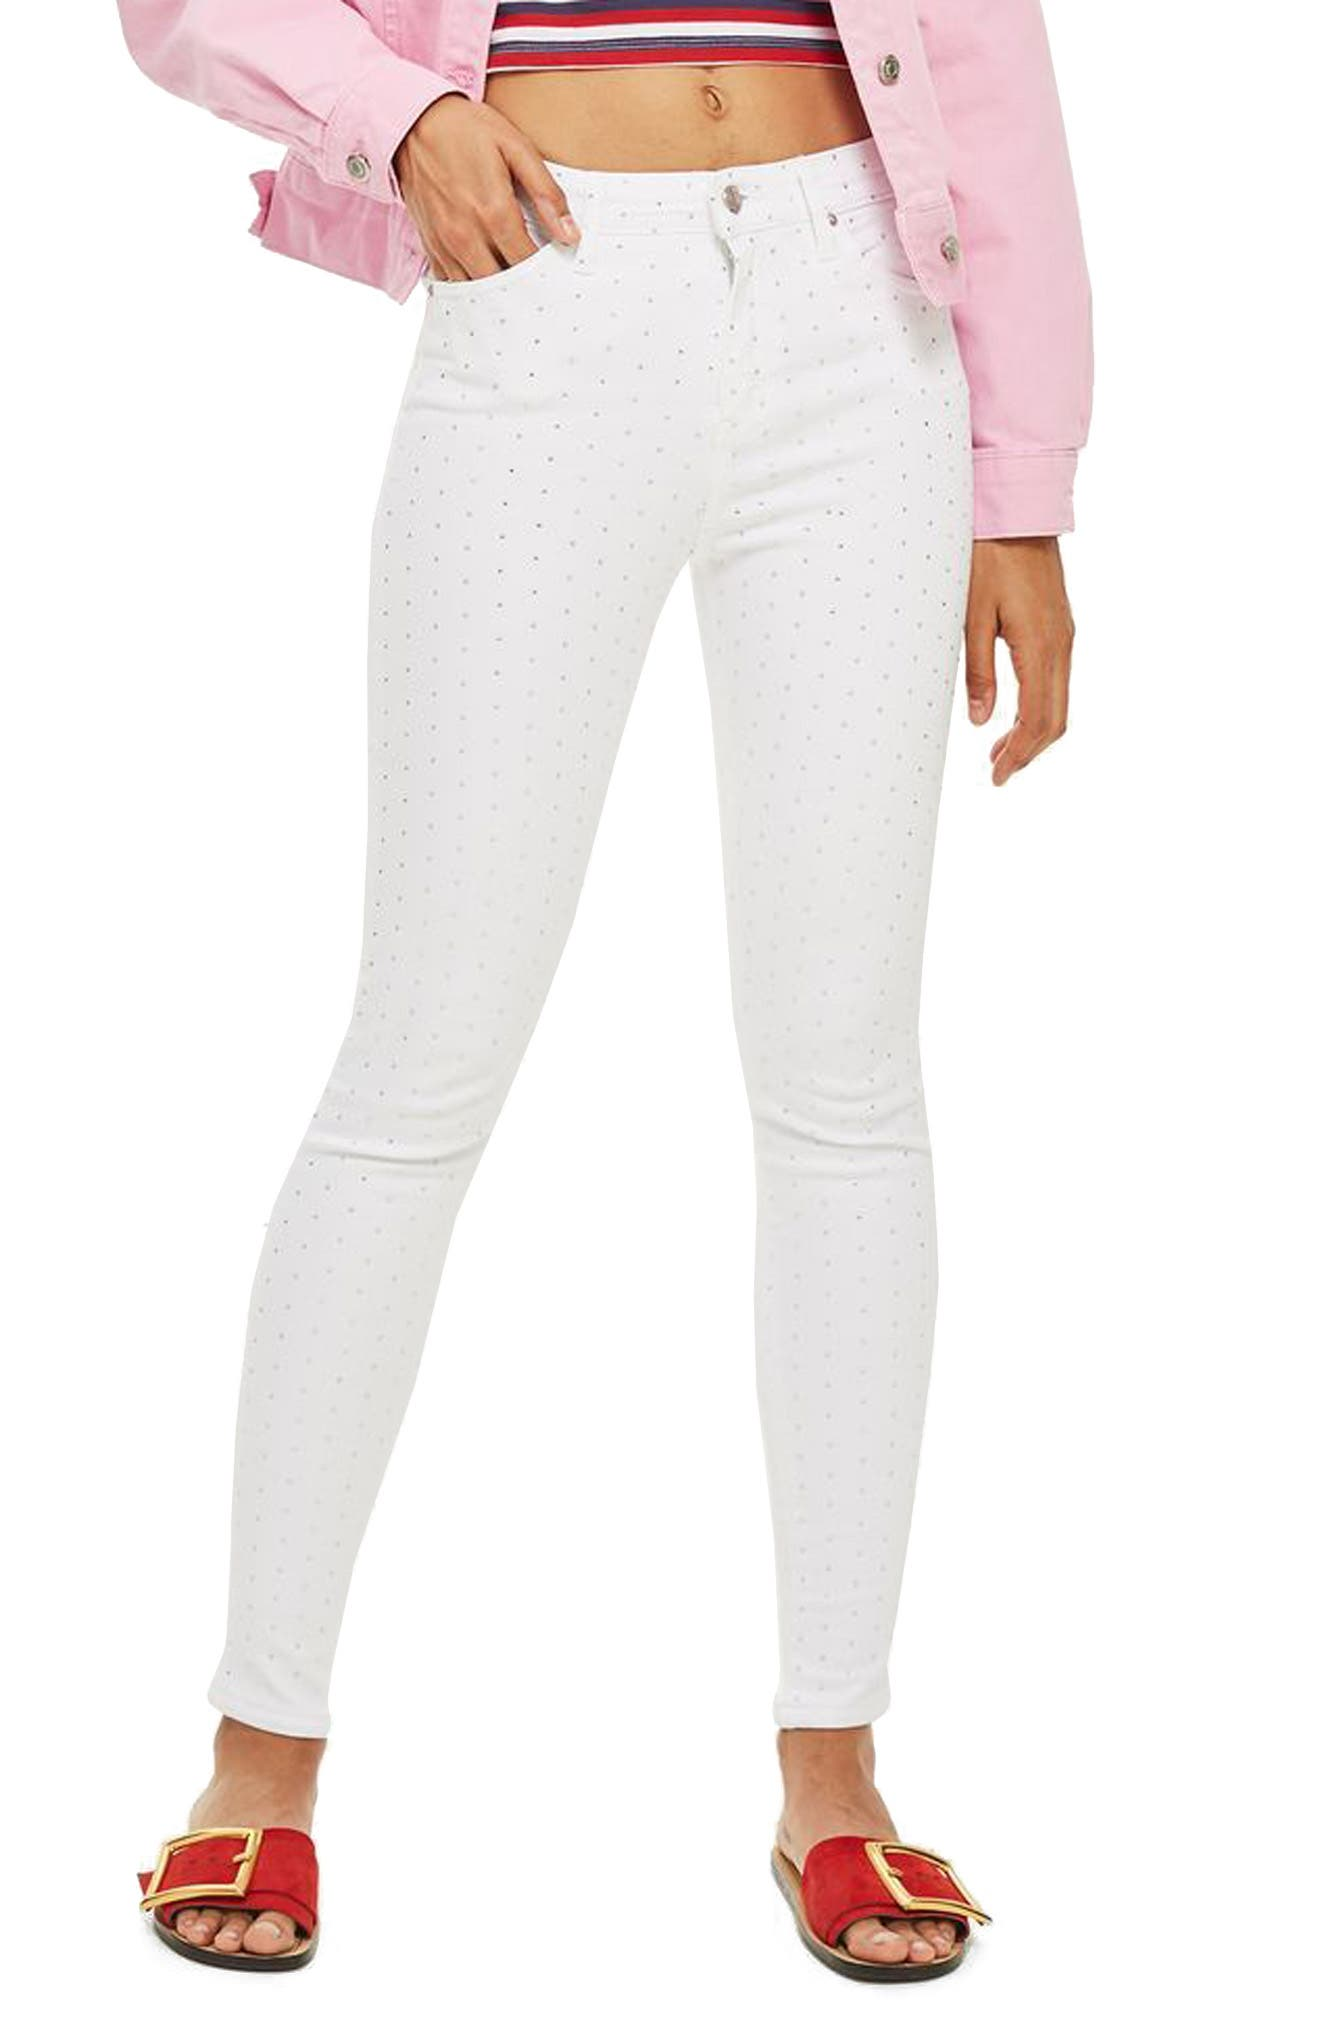 Jamie Diamante Skinny Jeans,                             Main thumbnail 1, color,                             White